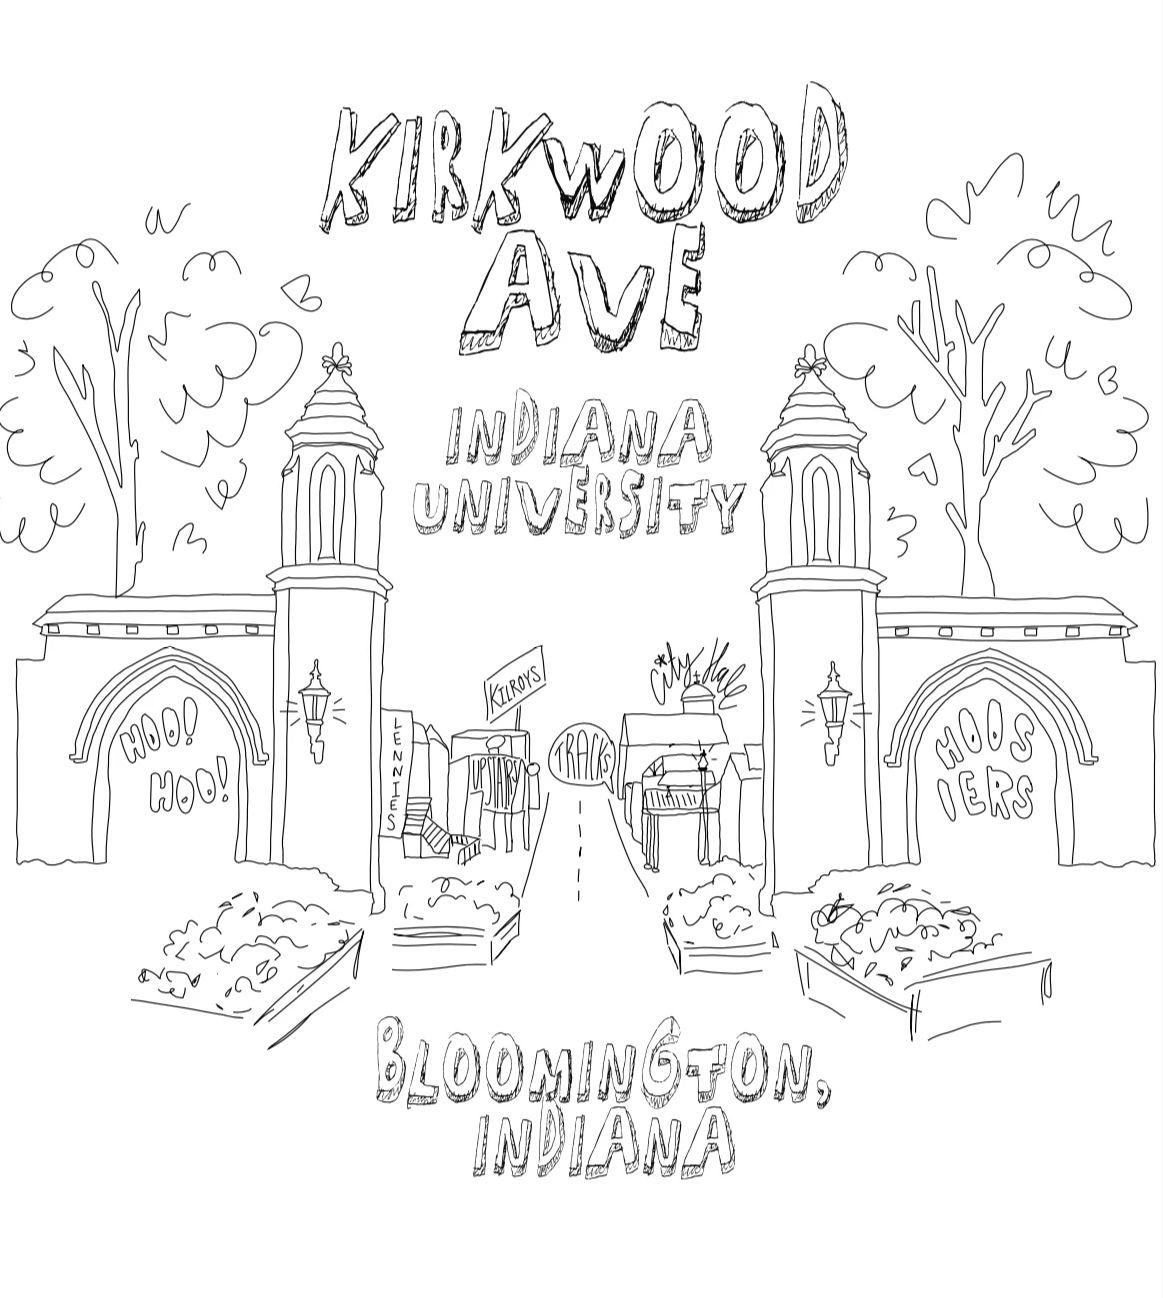 Regnery's cartoon Kirkwood design